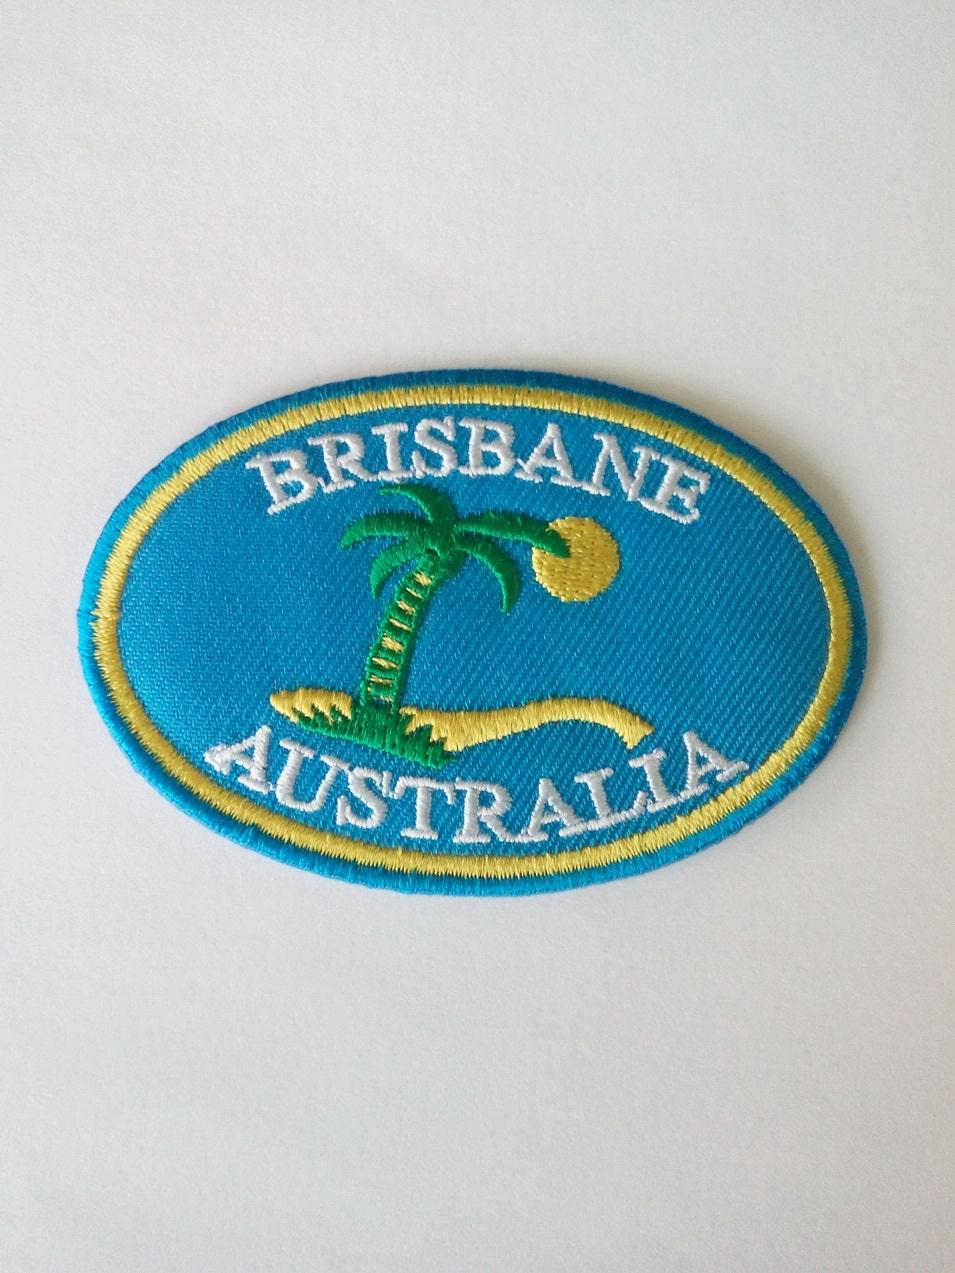 Embroidered brisbane australia wording iron on patch badge